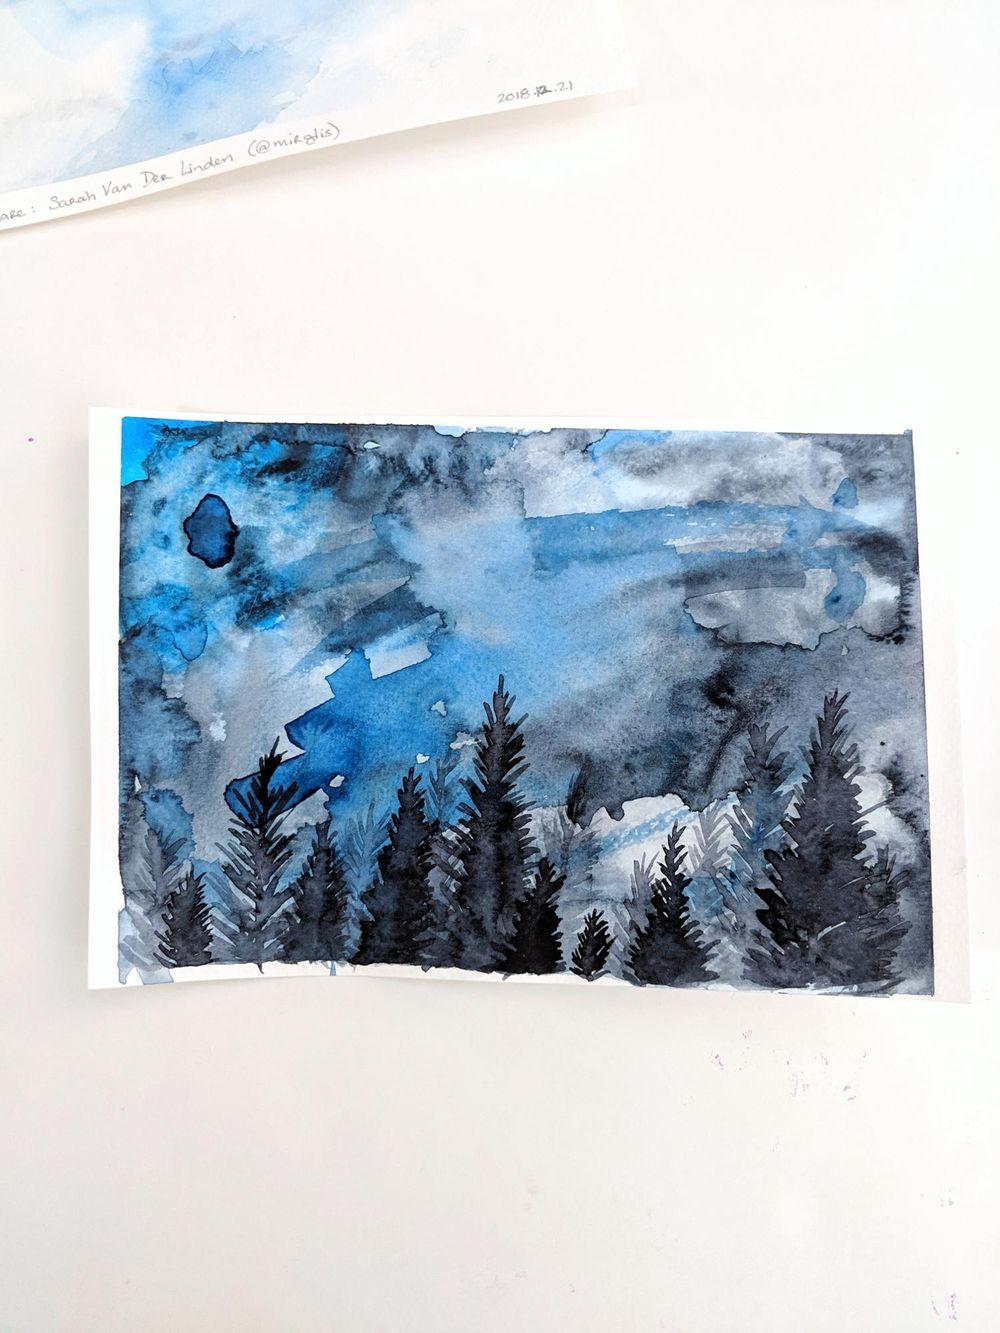 Ciels avec Sarah - image 1 - student project